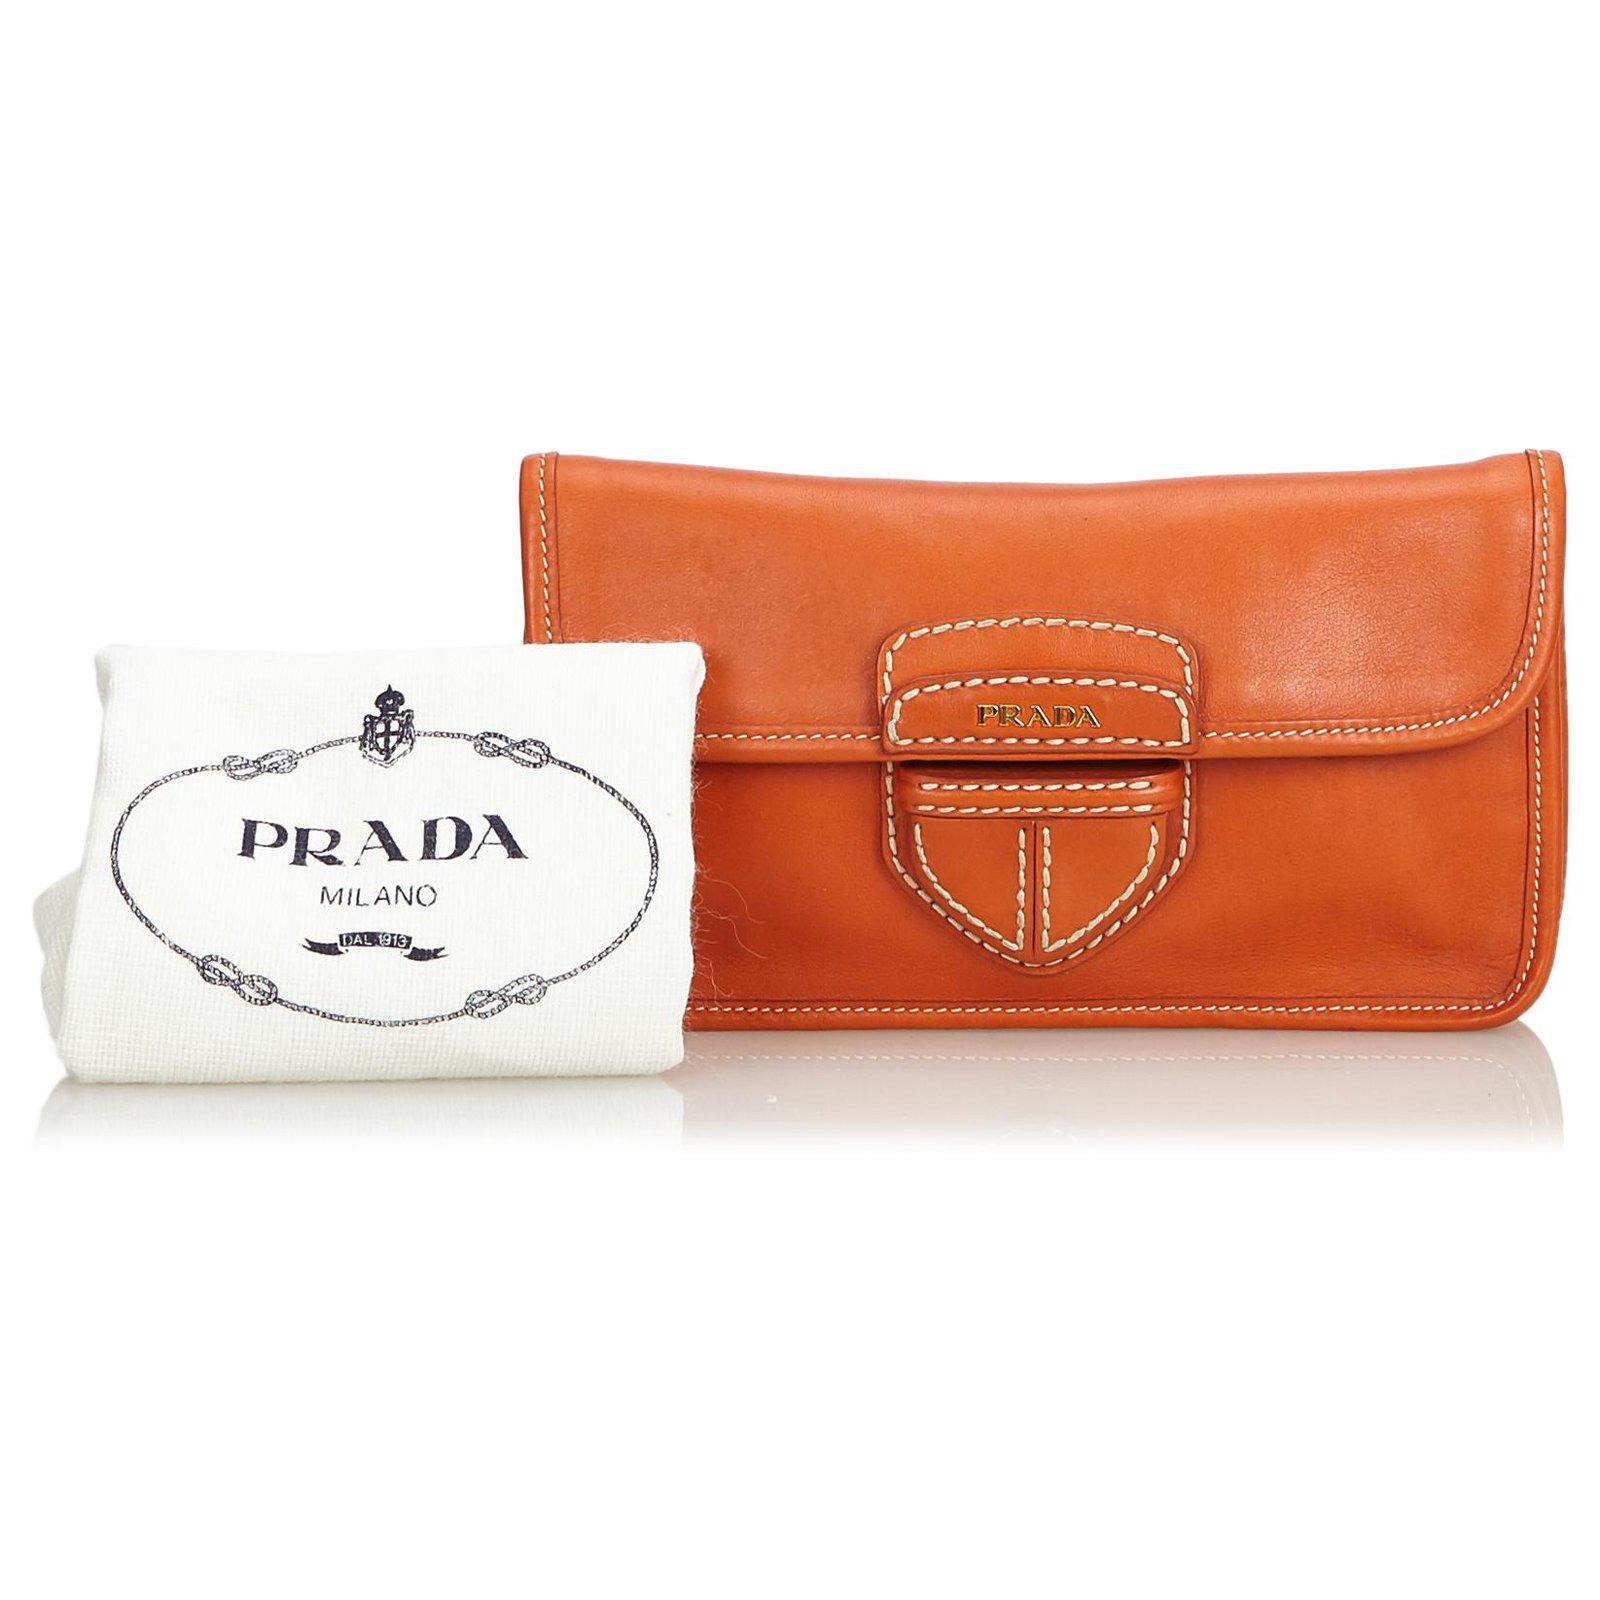 c13069fd0b70 Prada Prada Orange City Clutch Bag Clutch bags Leather,Other Orange  ref.121781 - Joli Closet